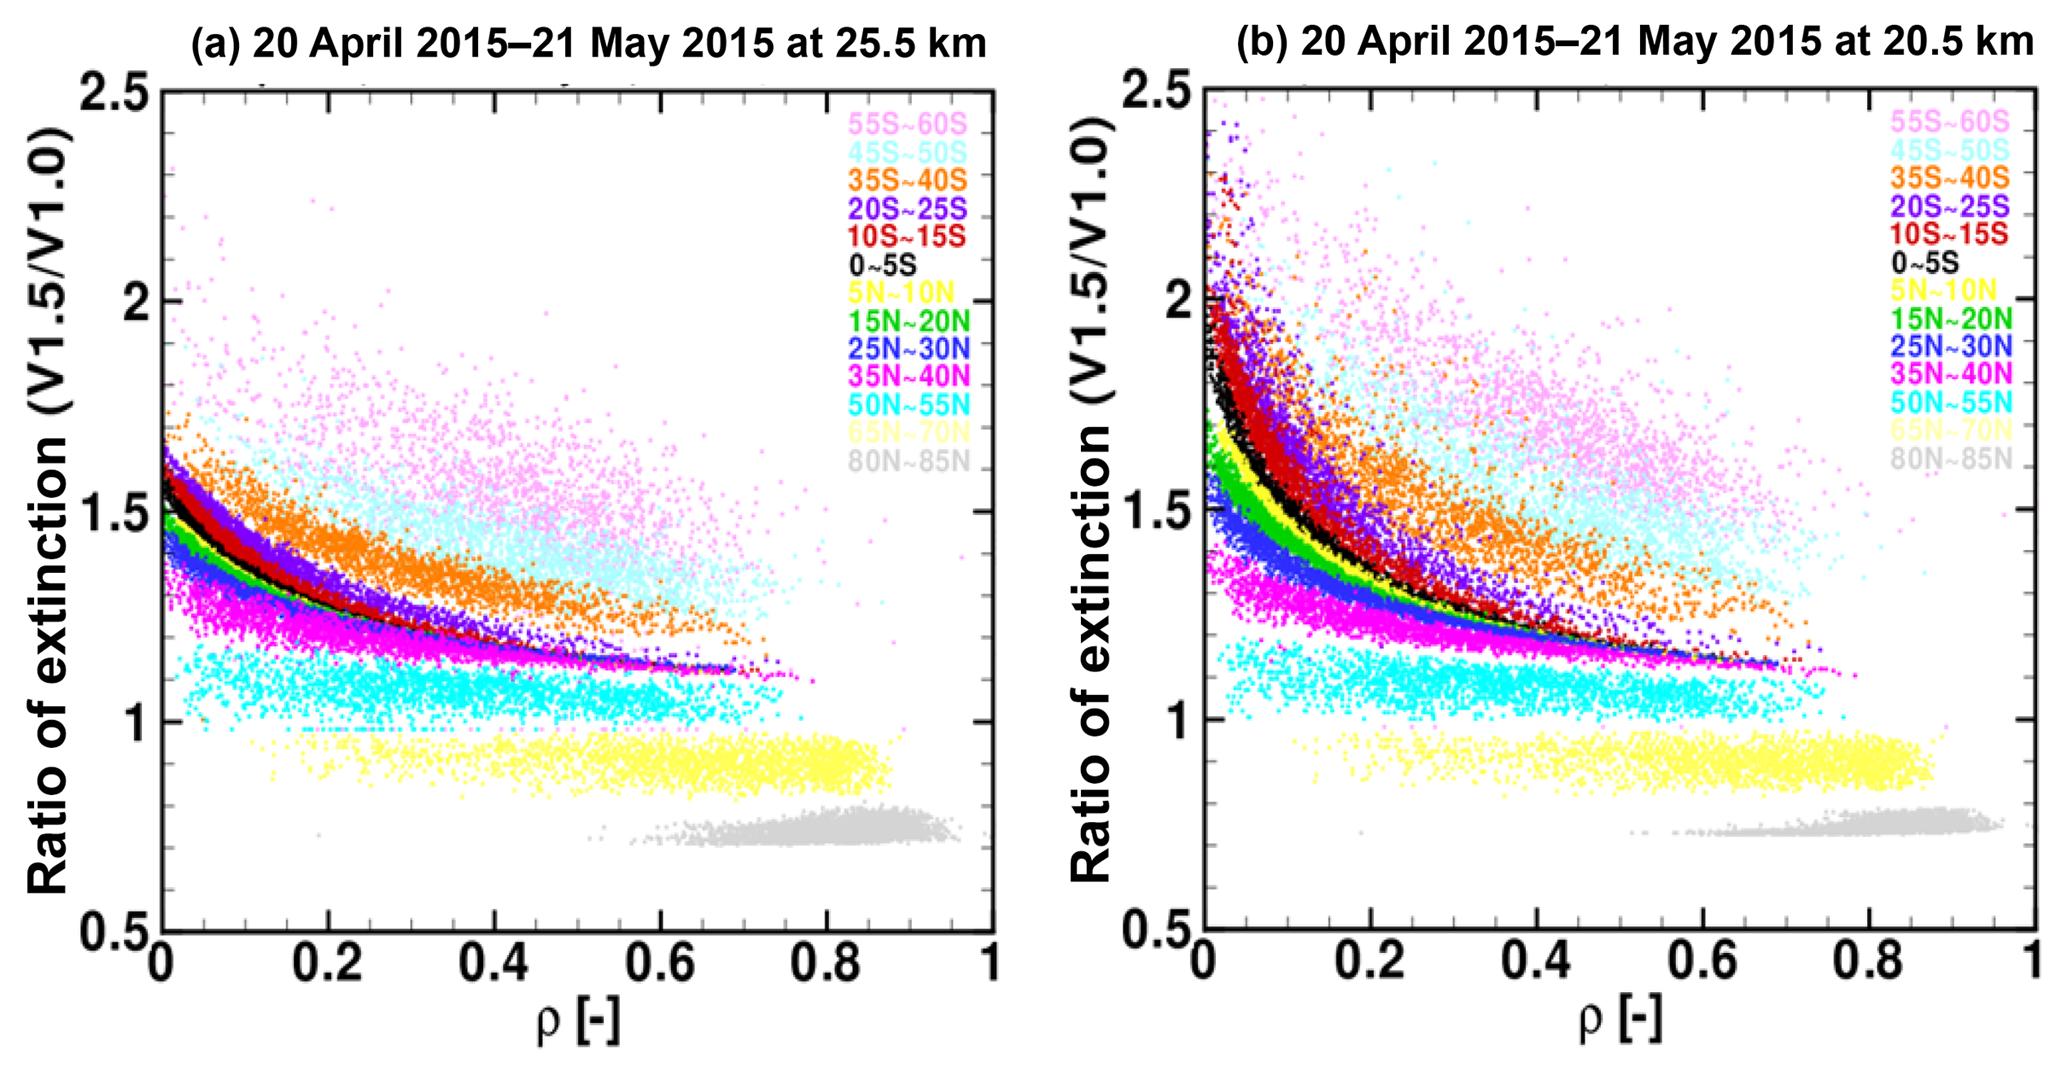 AMT - Improvement of stratospheric aerosol extinction retrieval from